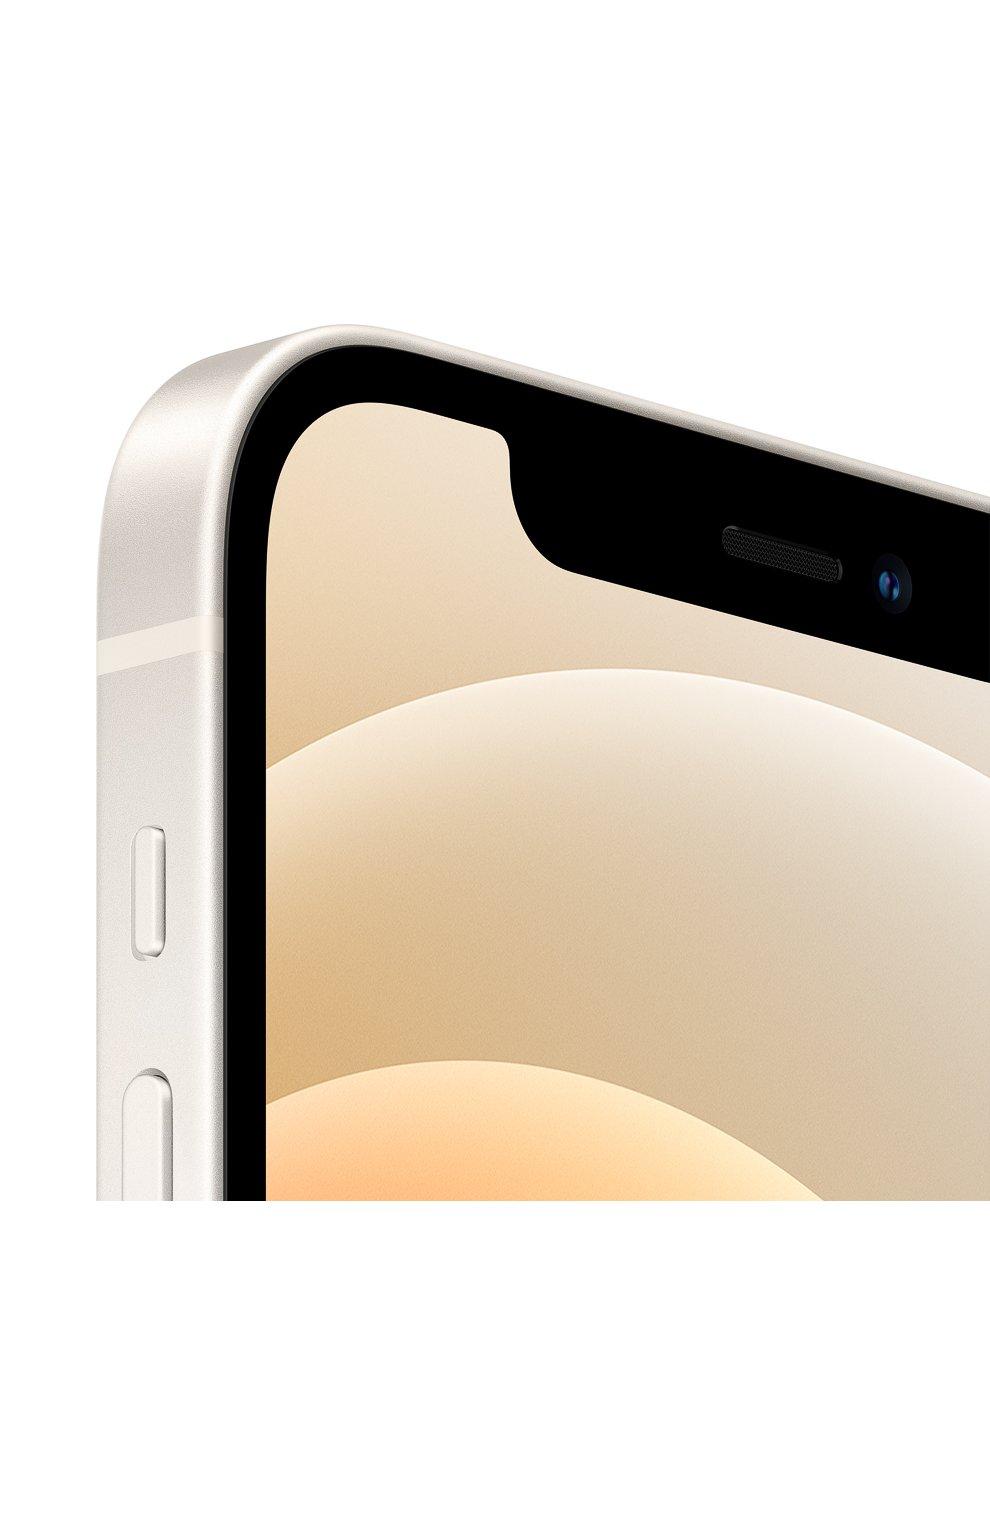 Мужские iphone 12 256gb white APPLE  white цвета, арт. MGJH3RU/A | Фото 2